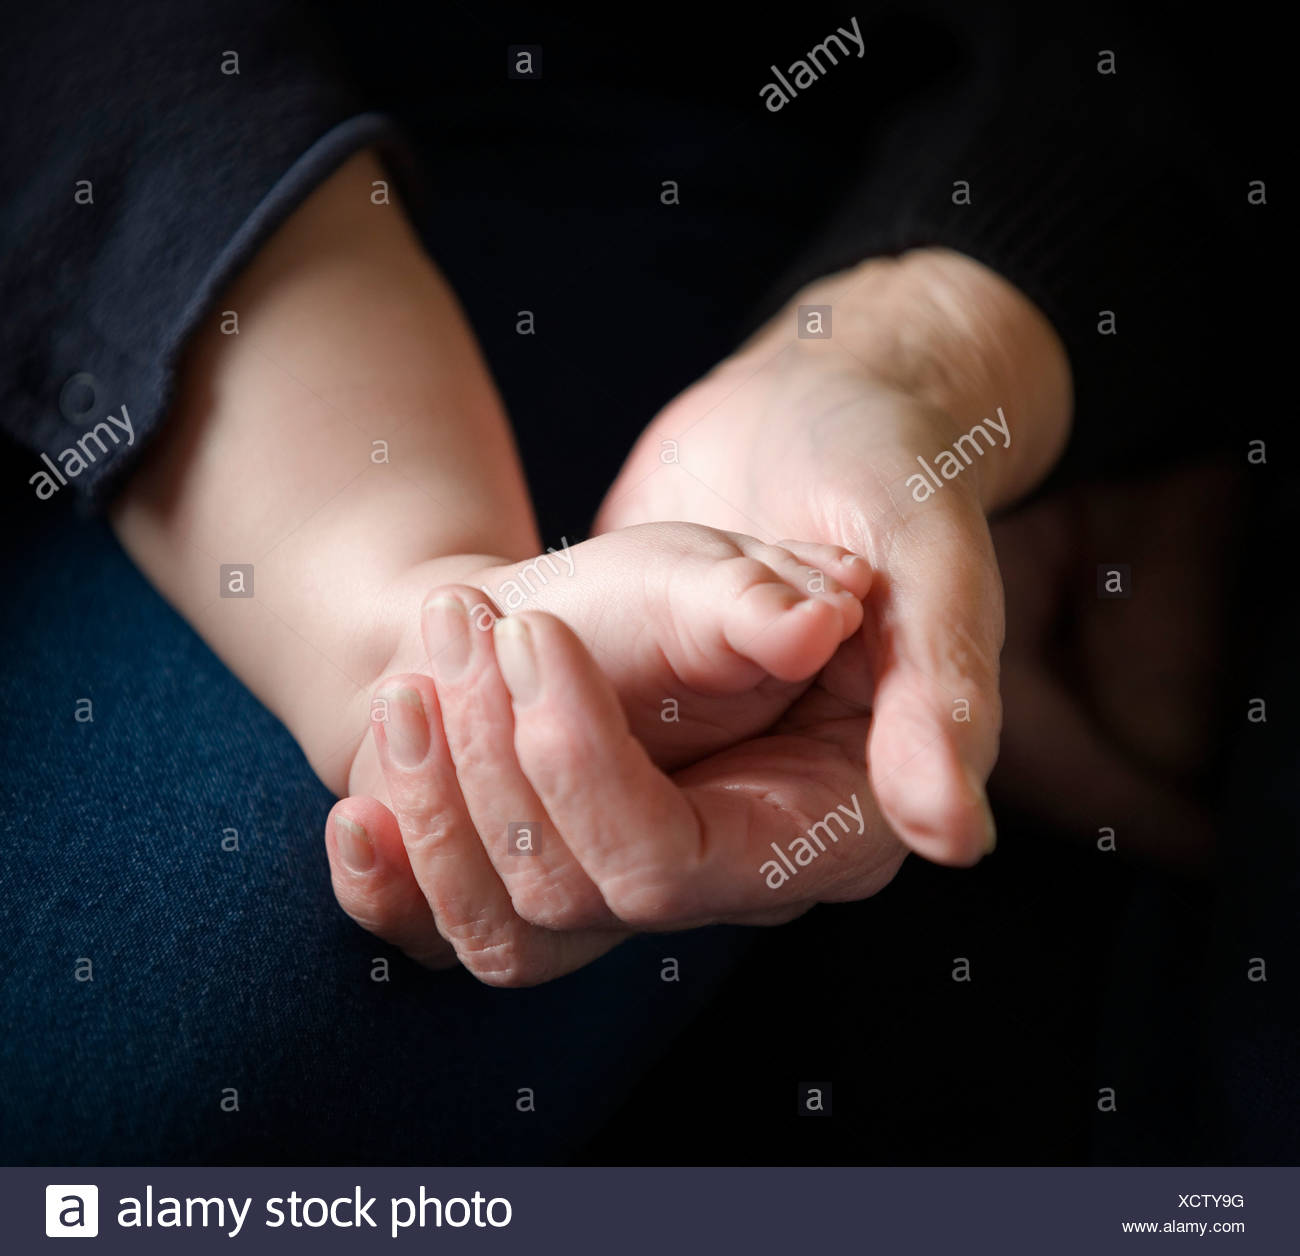 Grandparent with child - Stock Image